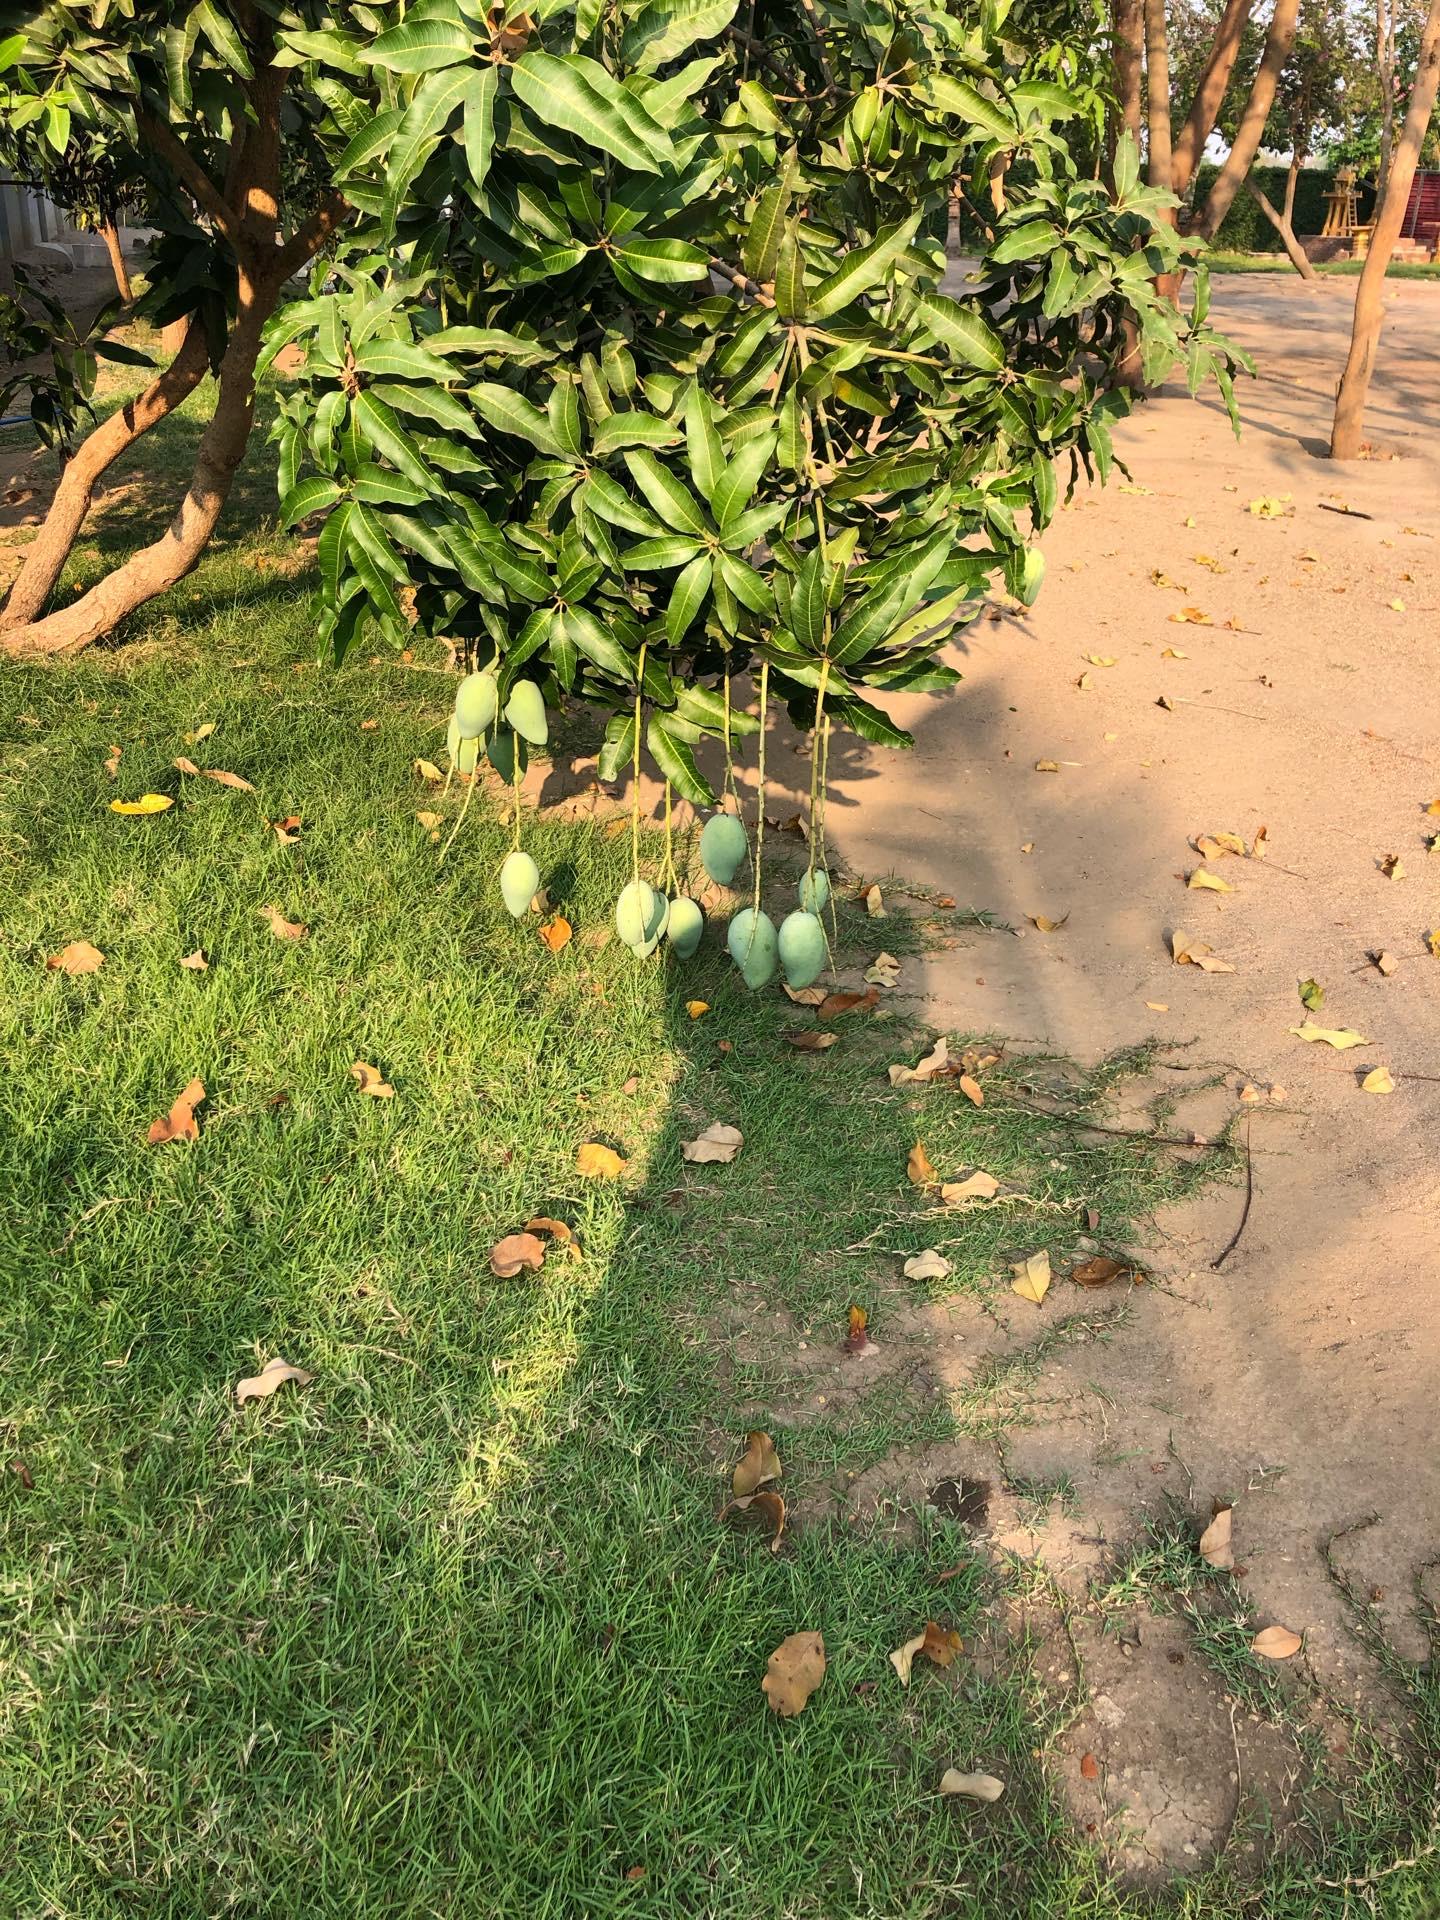 What's in your garden?-ef9d6101-ec3c-48e5-b809-ff88ae4bbe24-jpeg